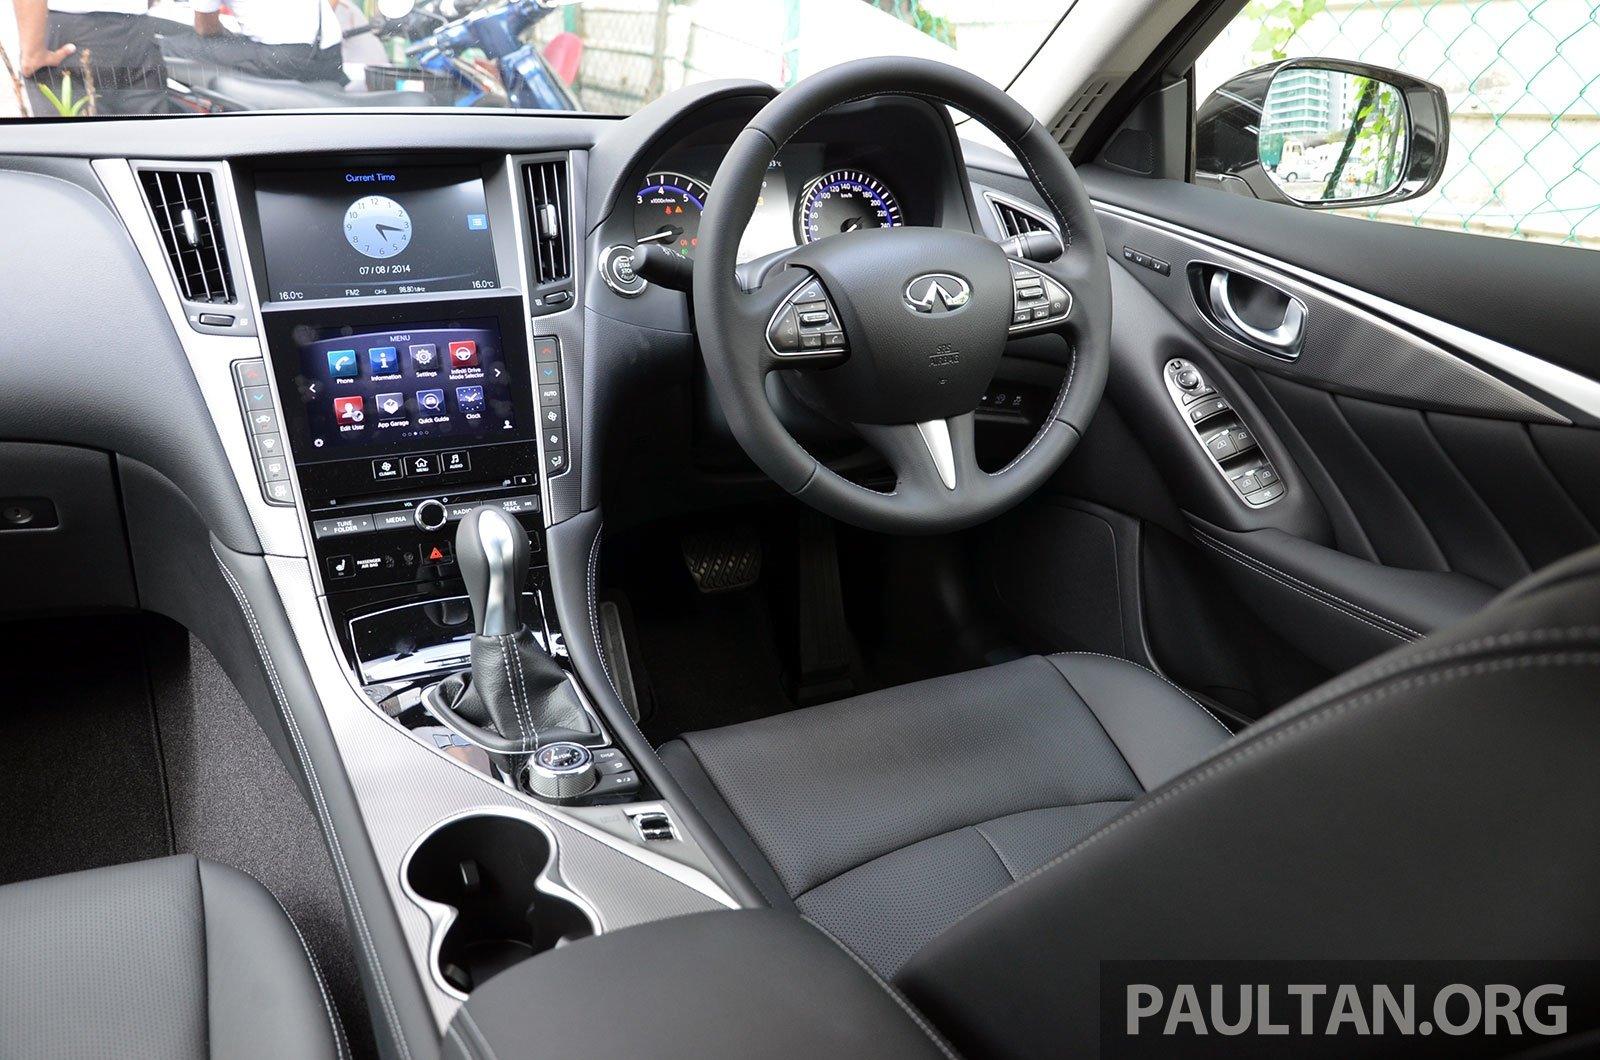 Infiniti Q50 Now In Showroom Merc Turbo Rm249k Paul Tan Image 262382